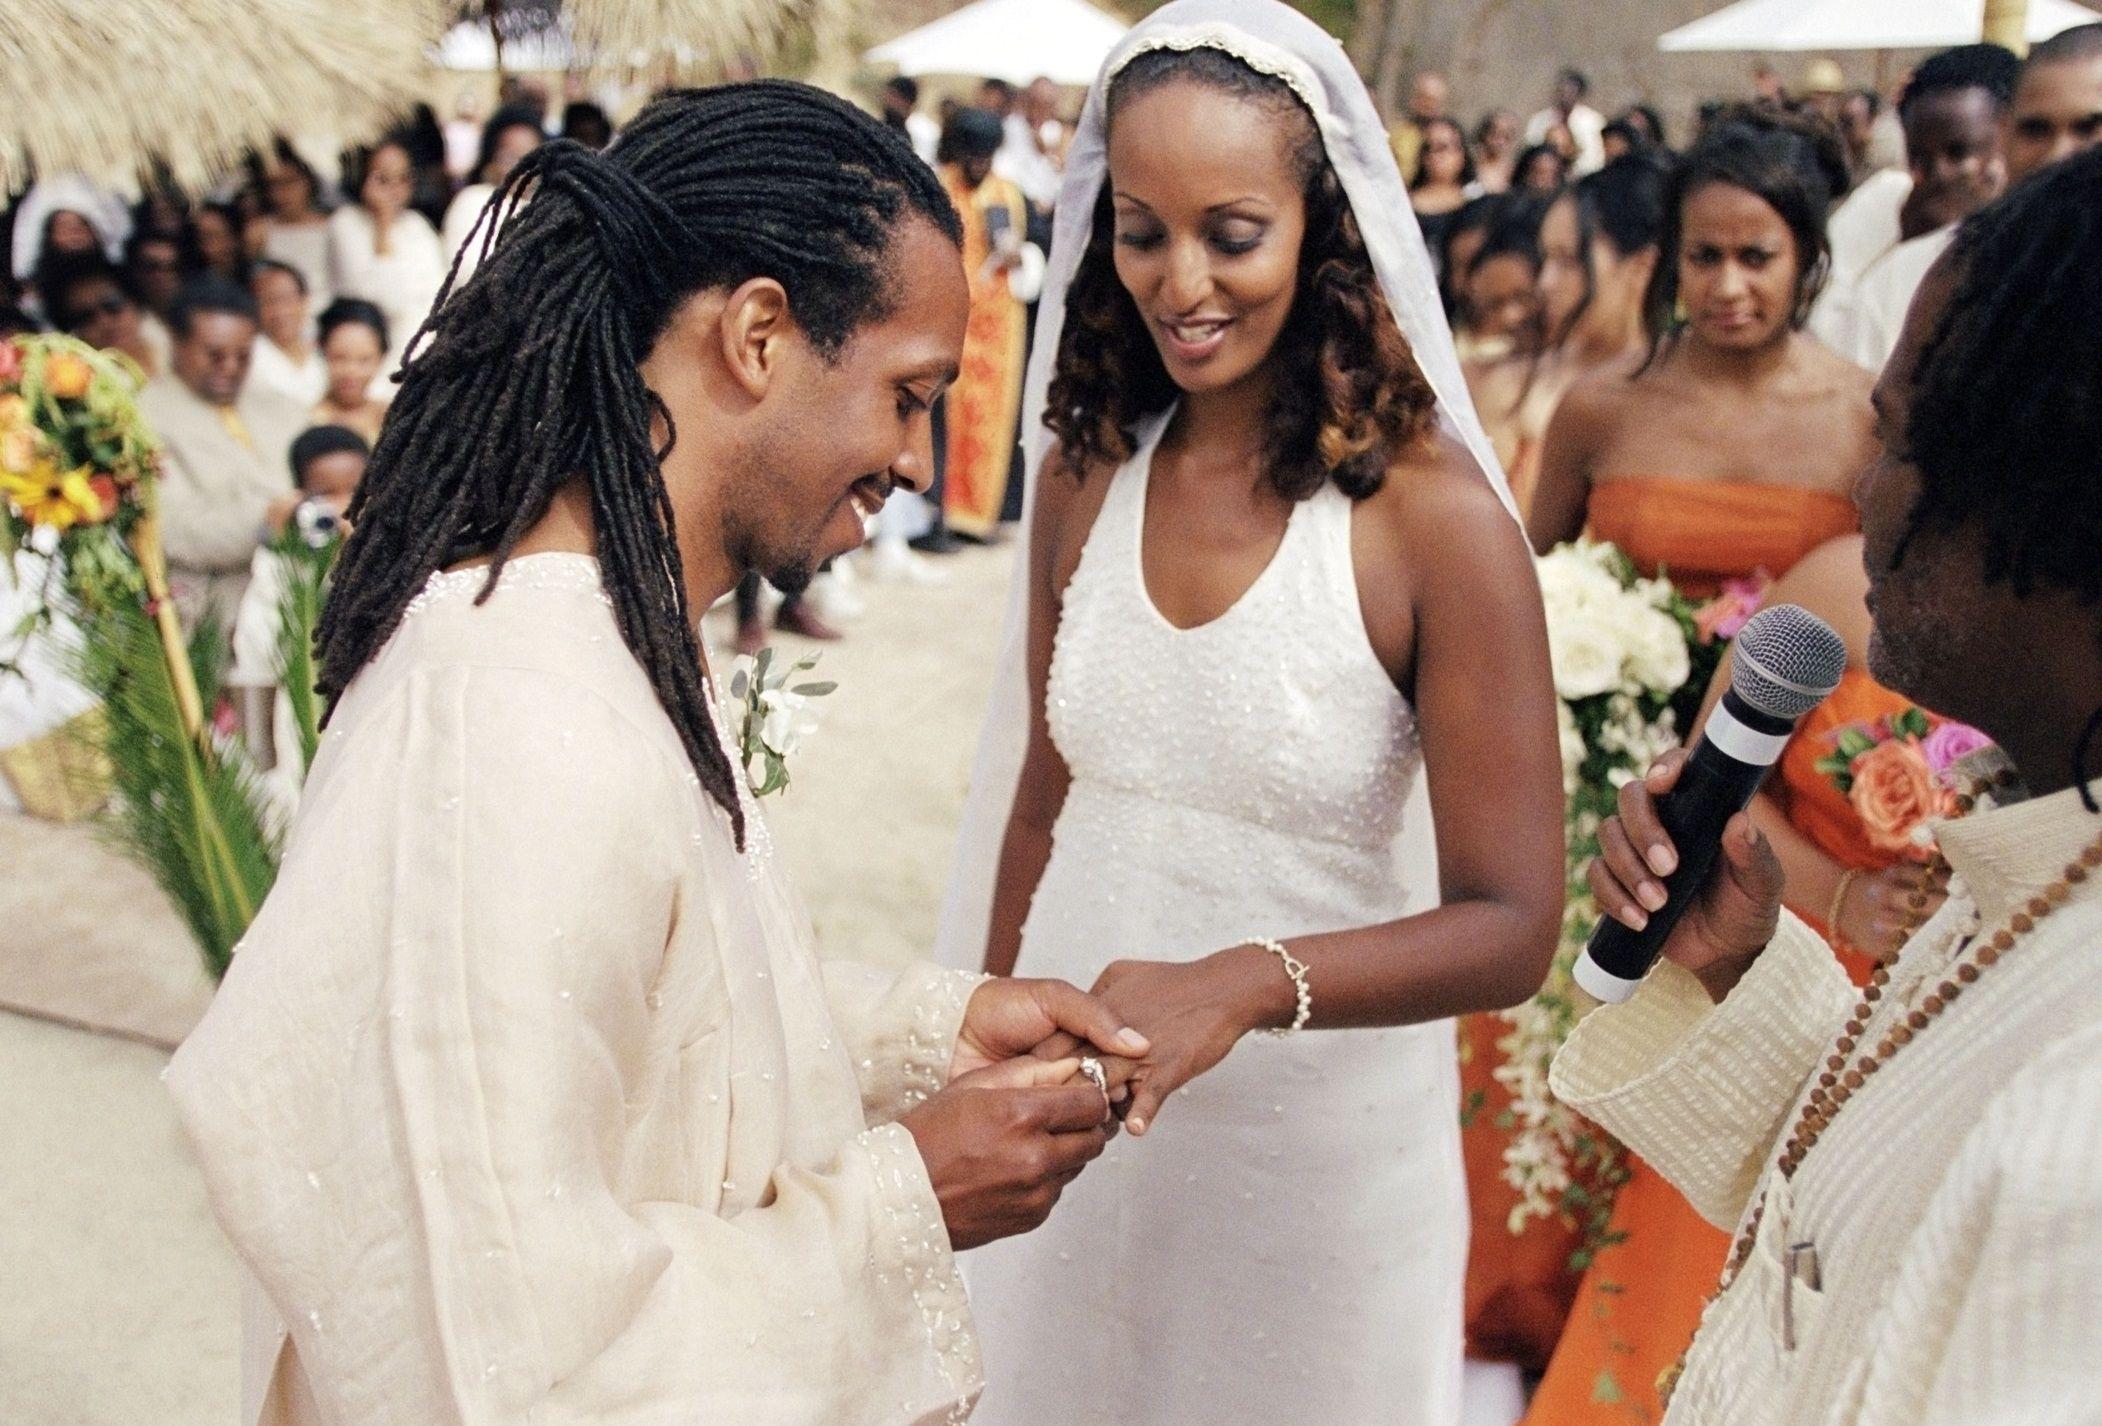 Original Samples of Wedding Vows